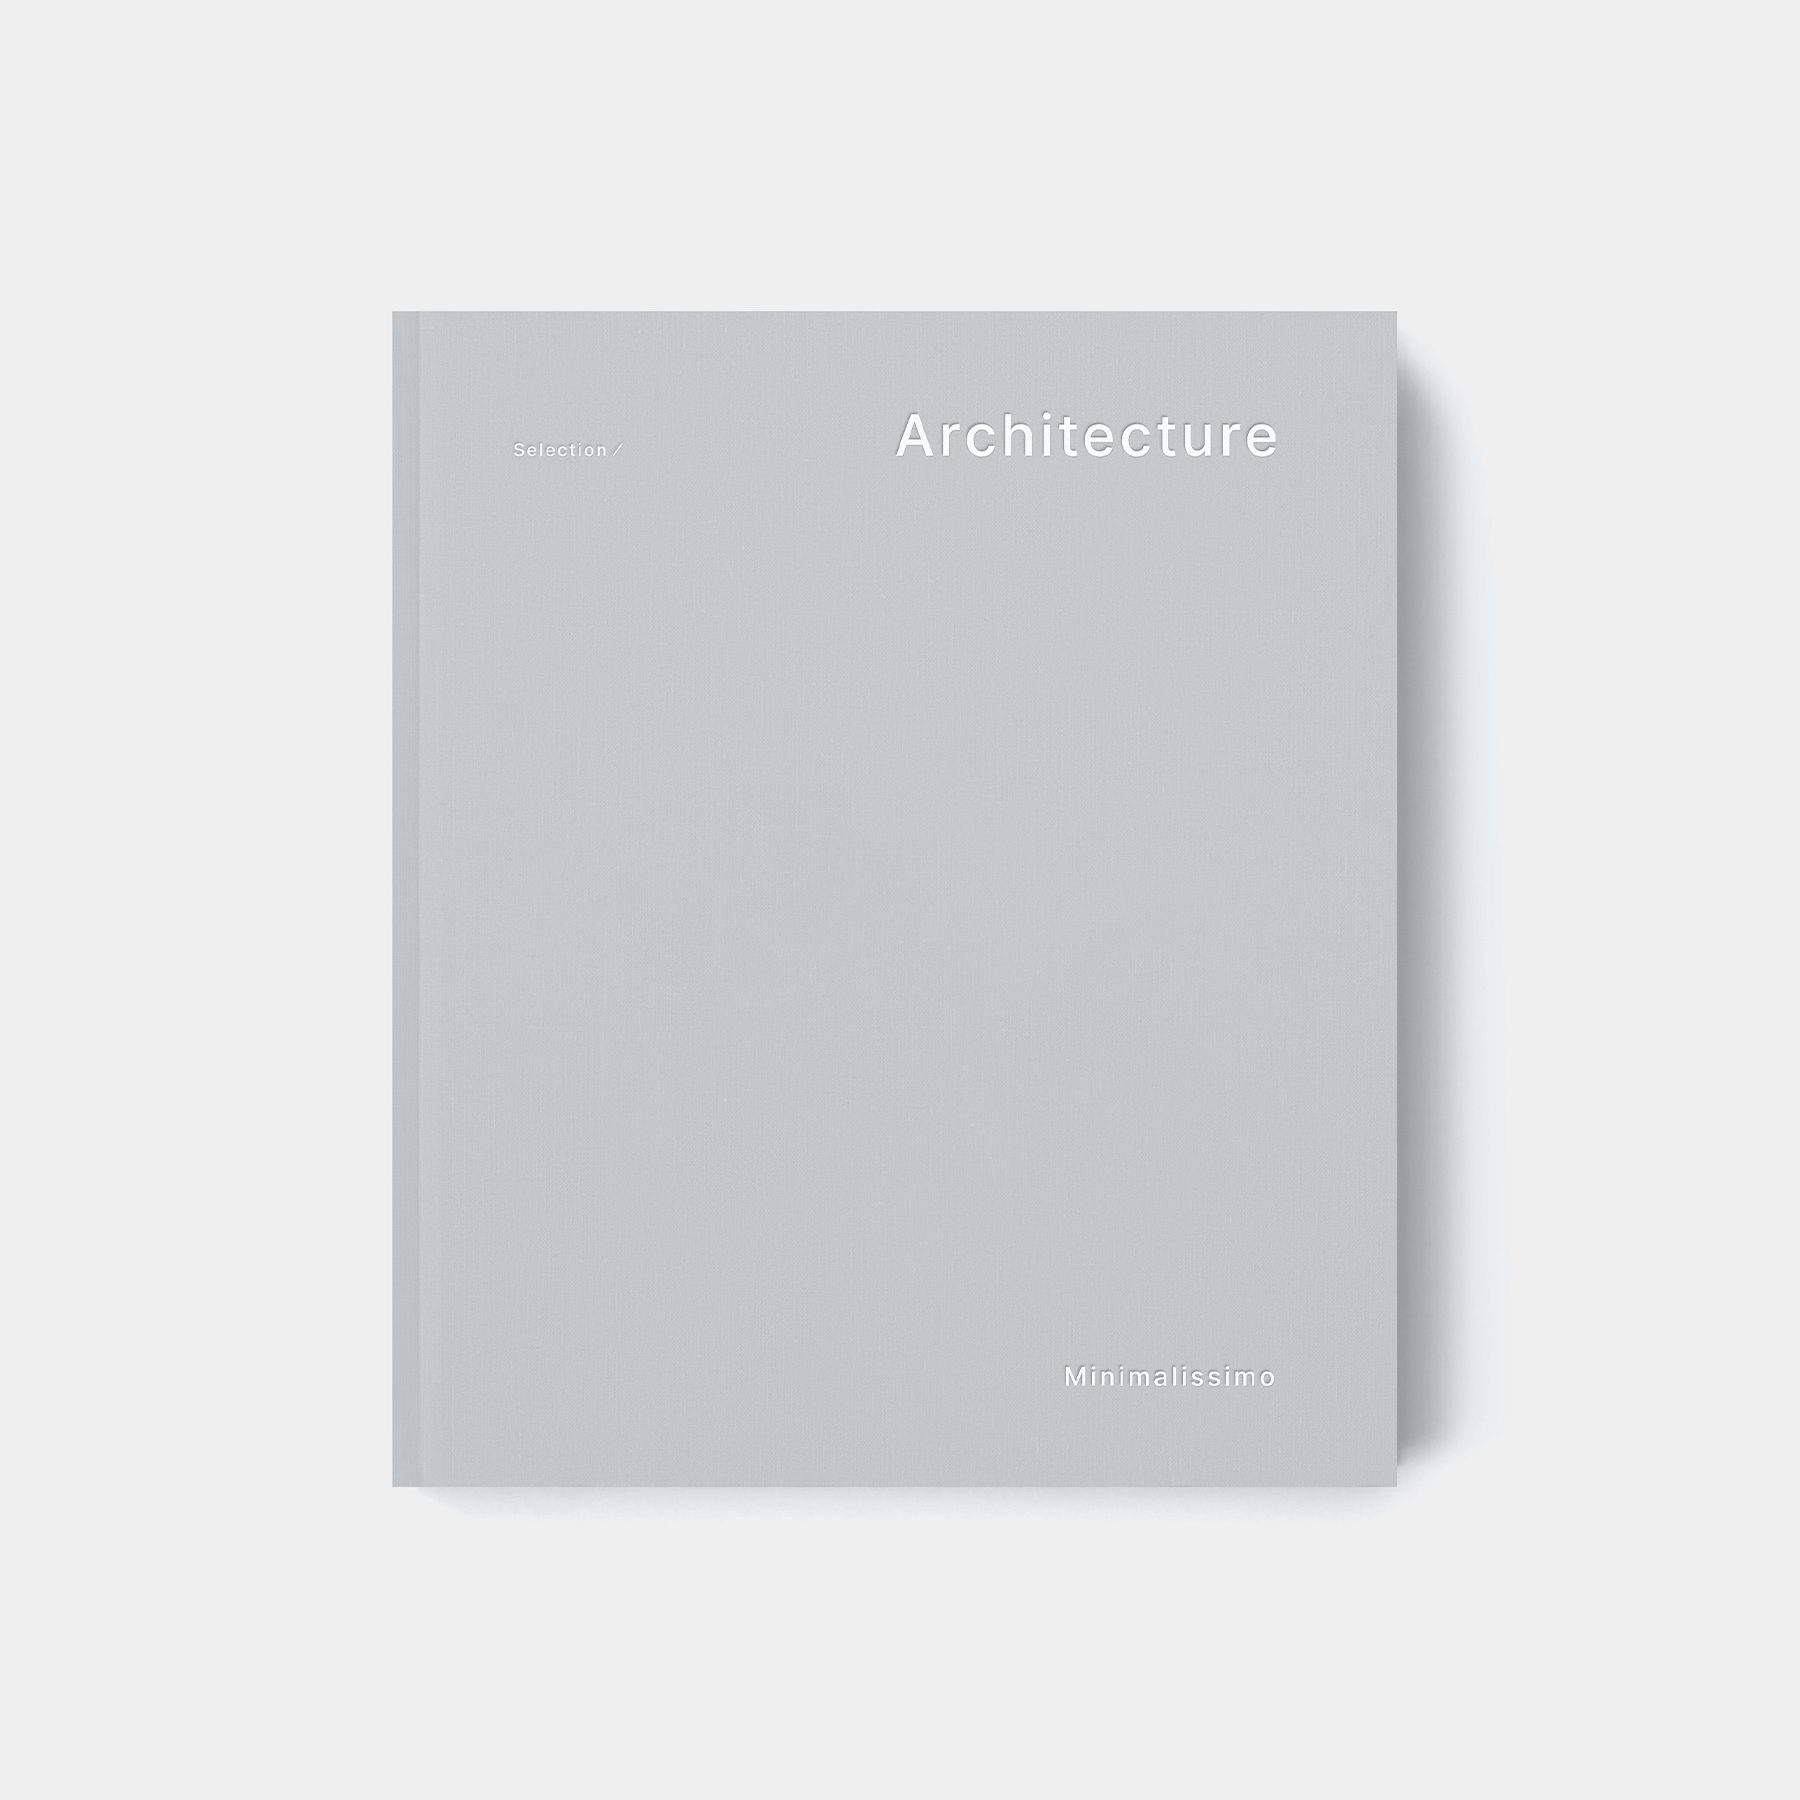 Minimalissimo Selection: Architecture